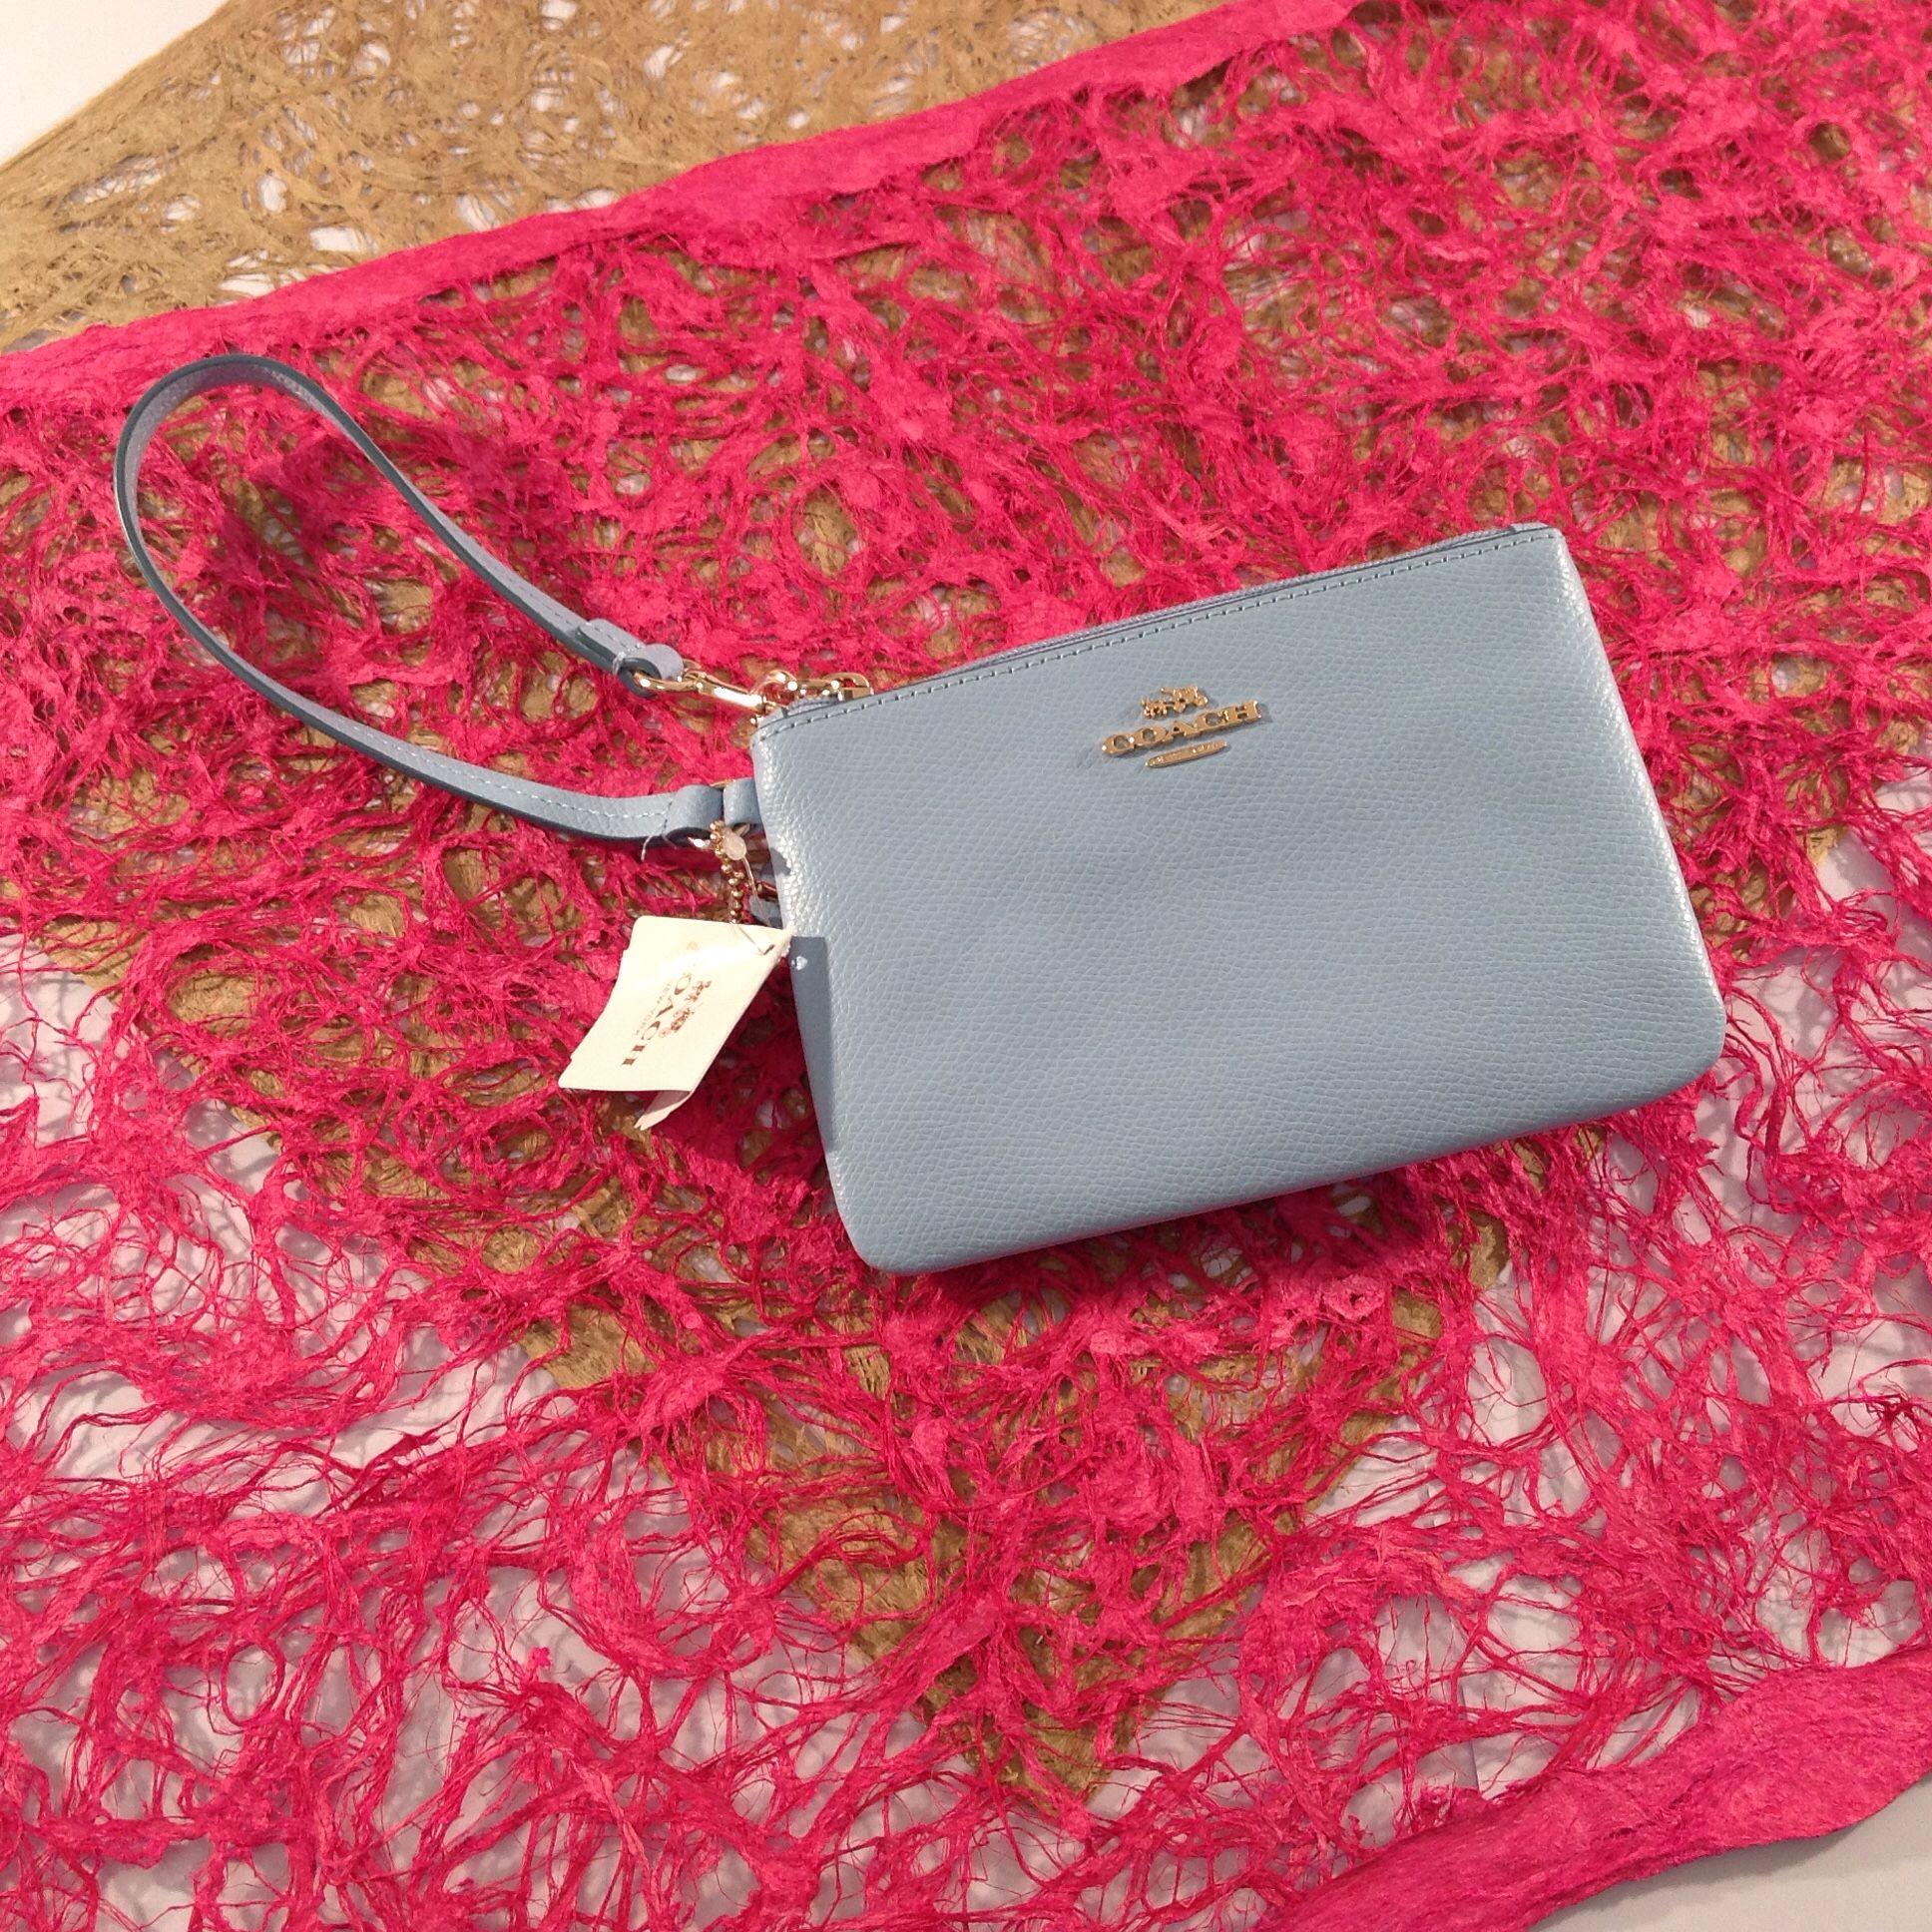 Coach factory outlet sale only coach purse for Last design outlet